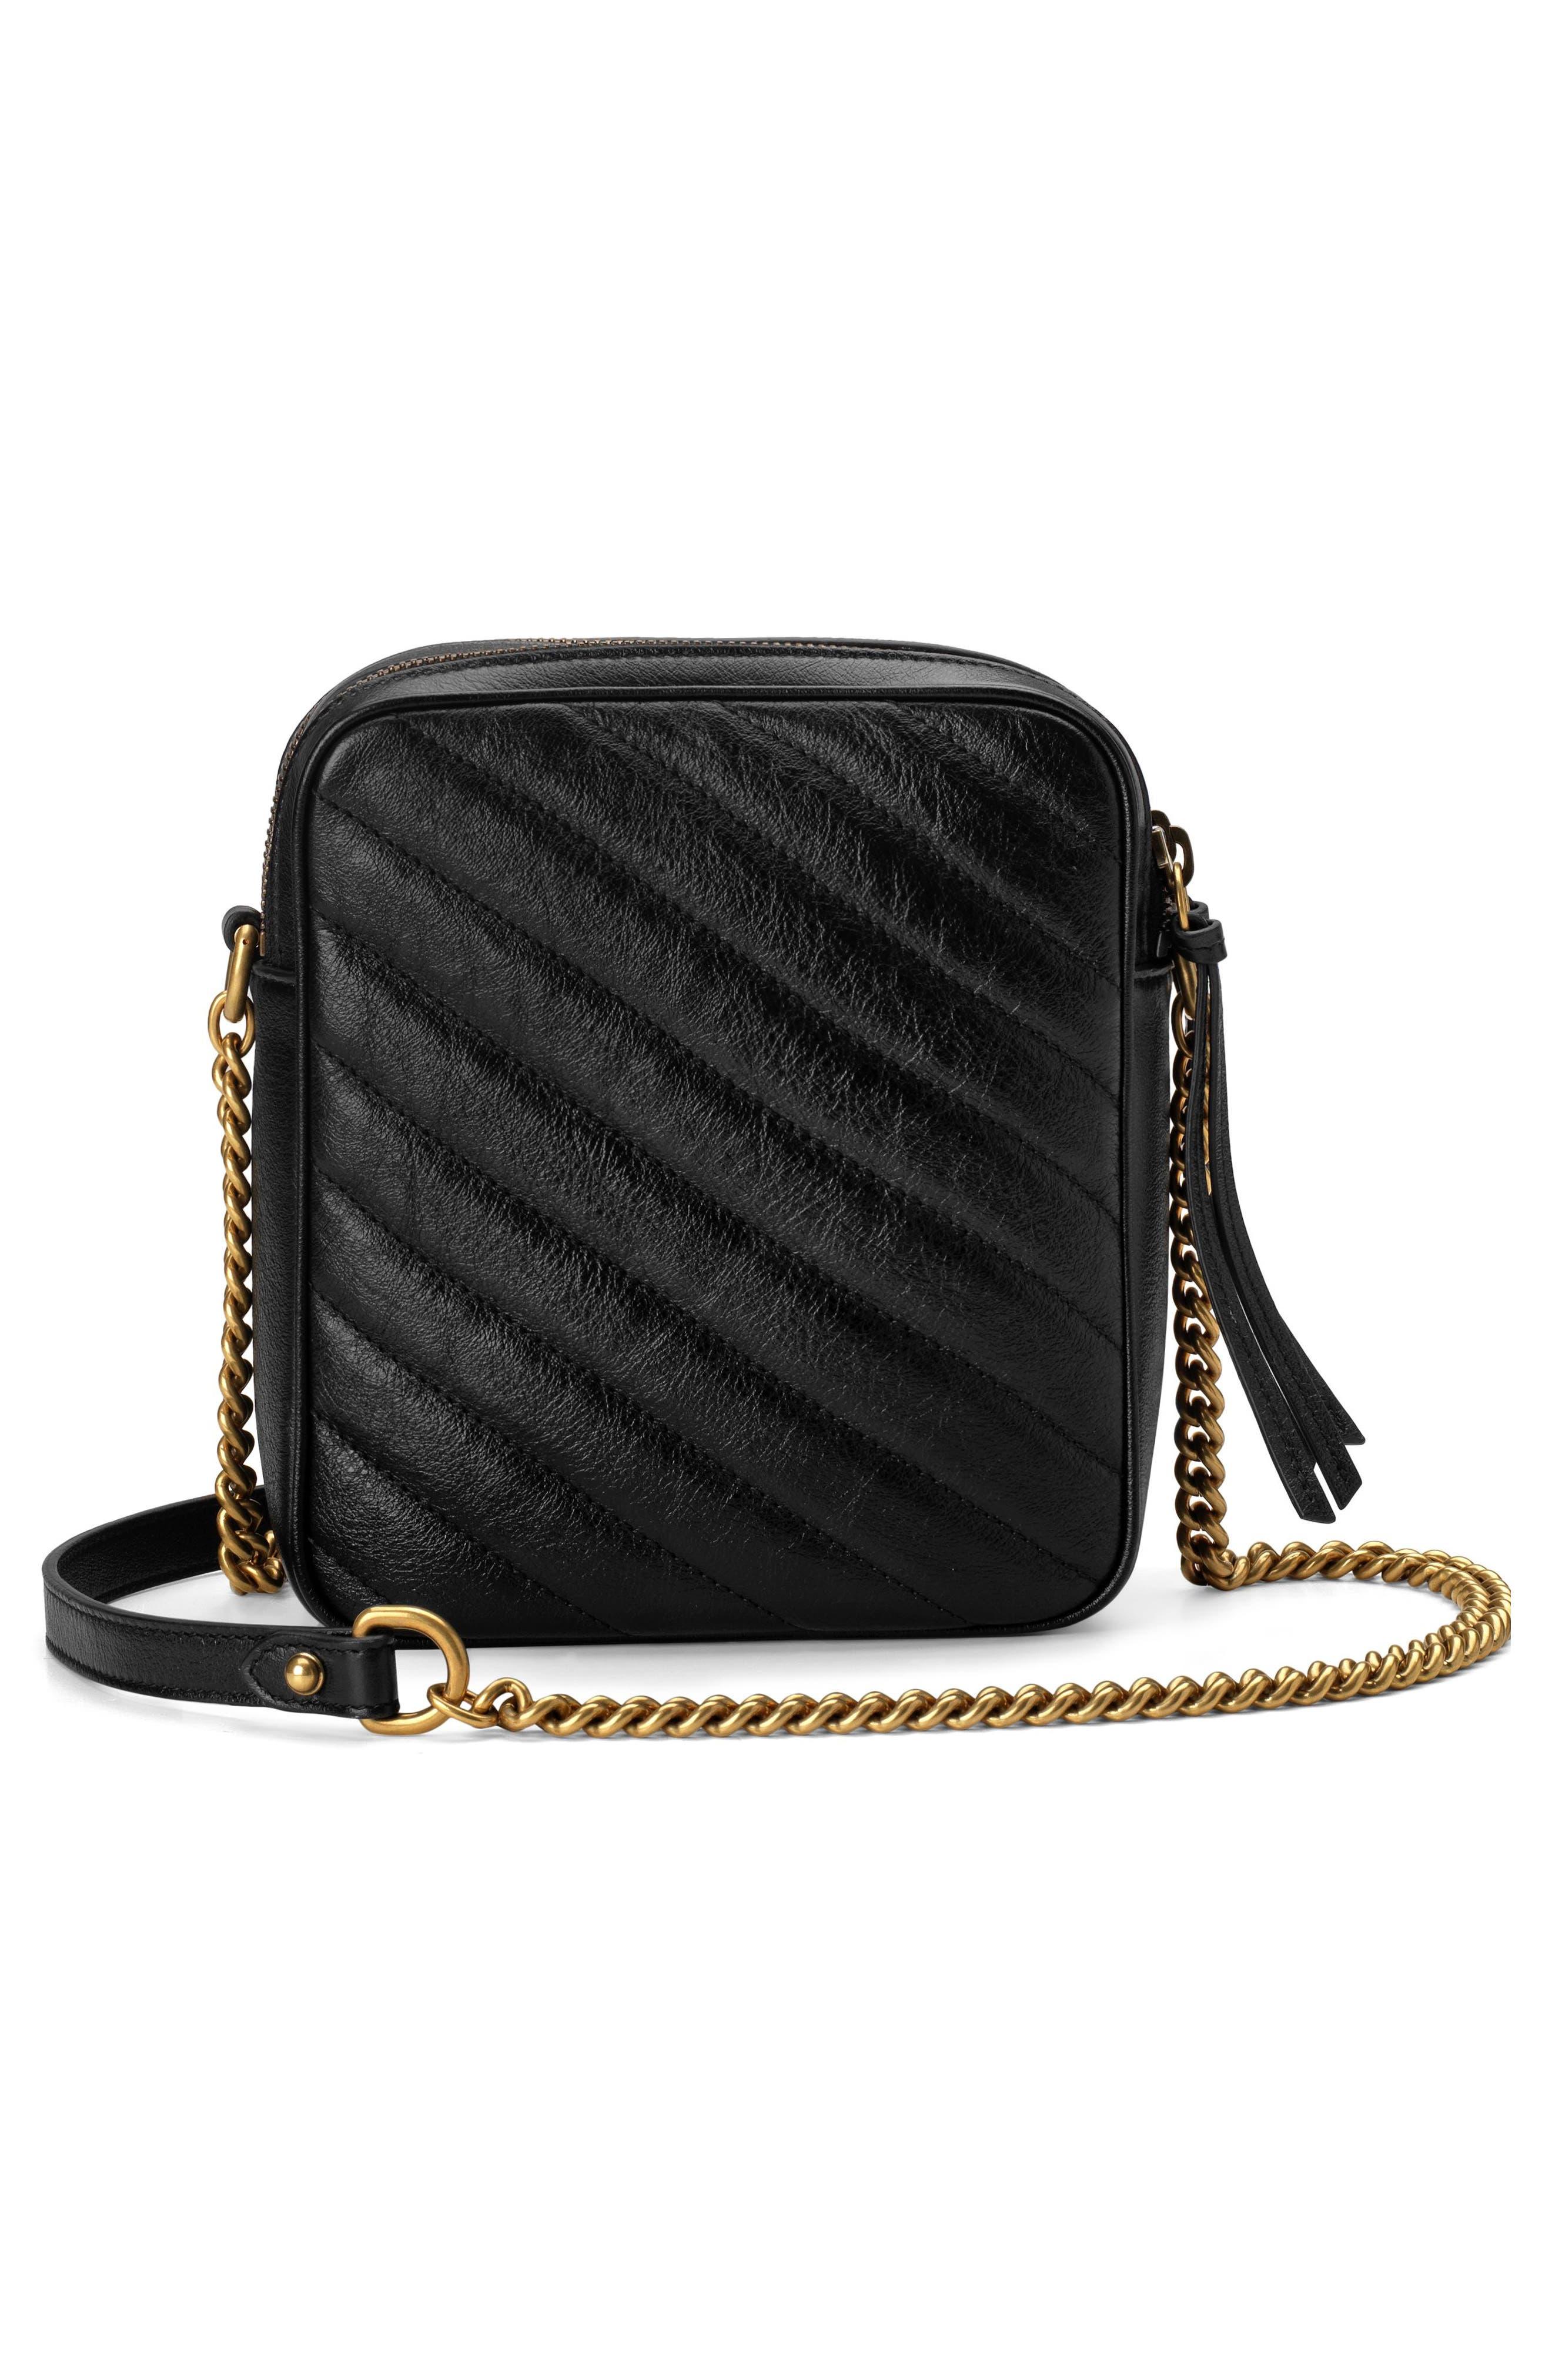 Mini Marmont 2.0 Leather Crossbody Bag,                             Alternate thumbnail 2, color,                             NERO